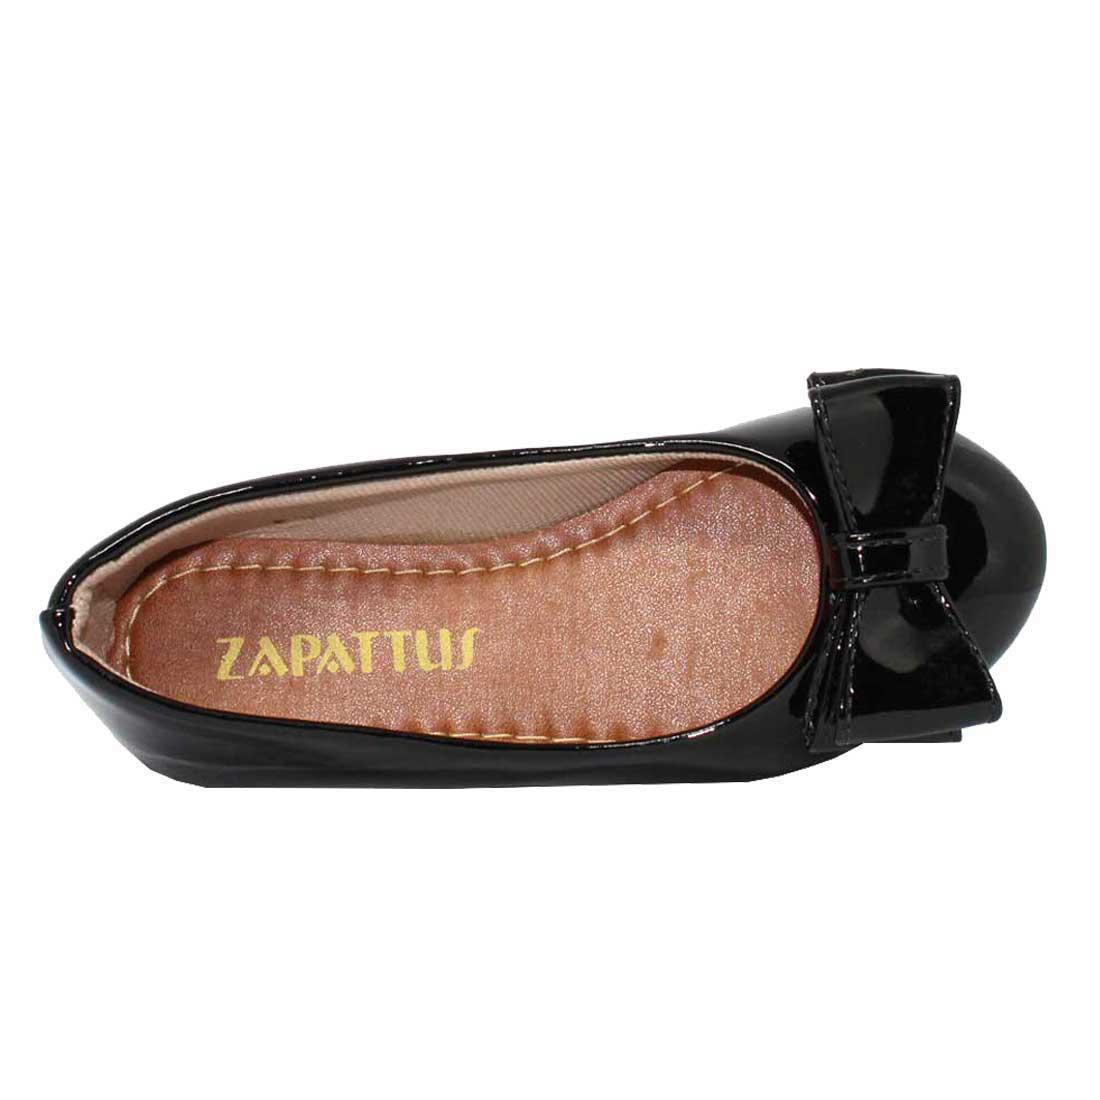 Sapatilha Infantil Girl Zapattus